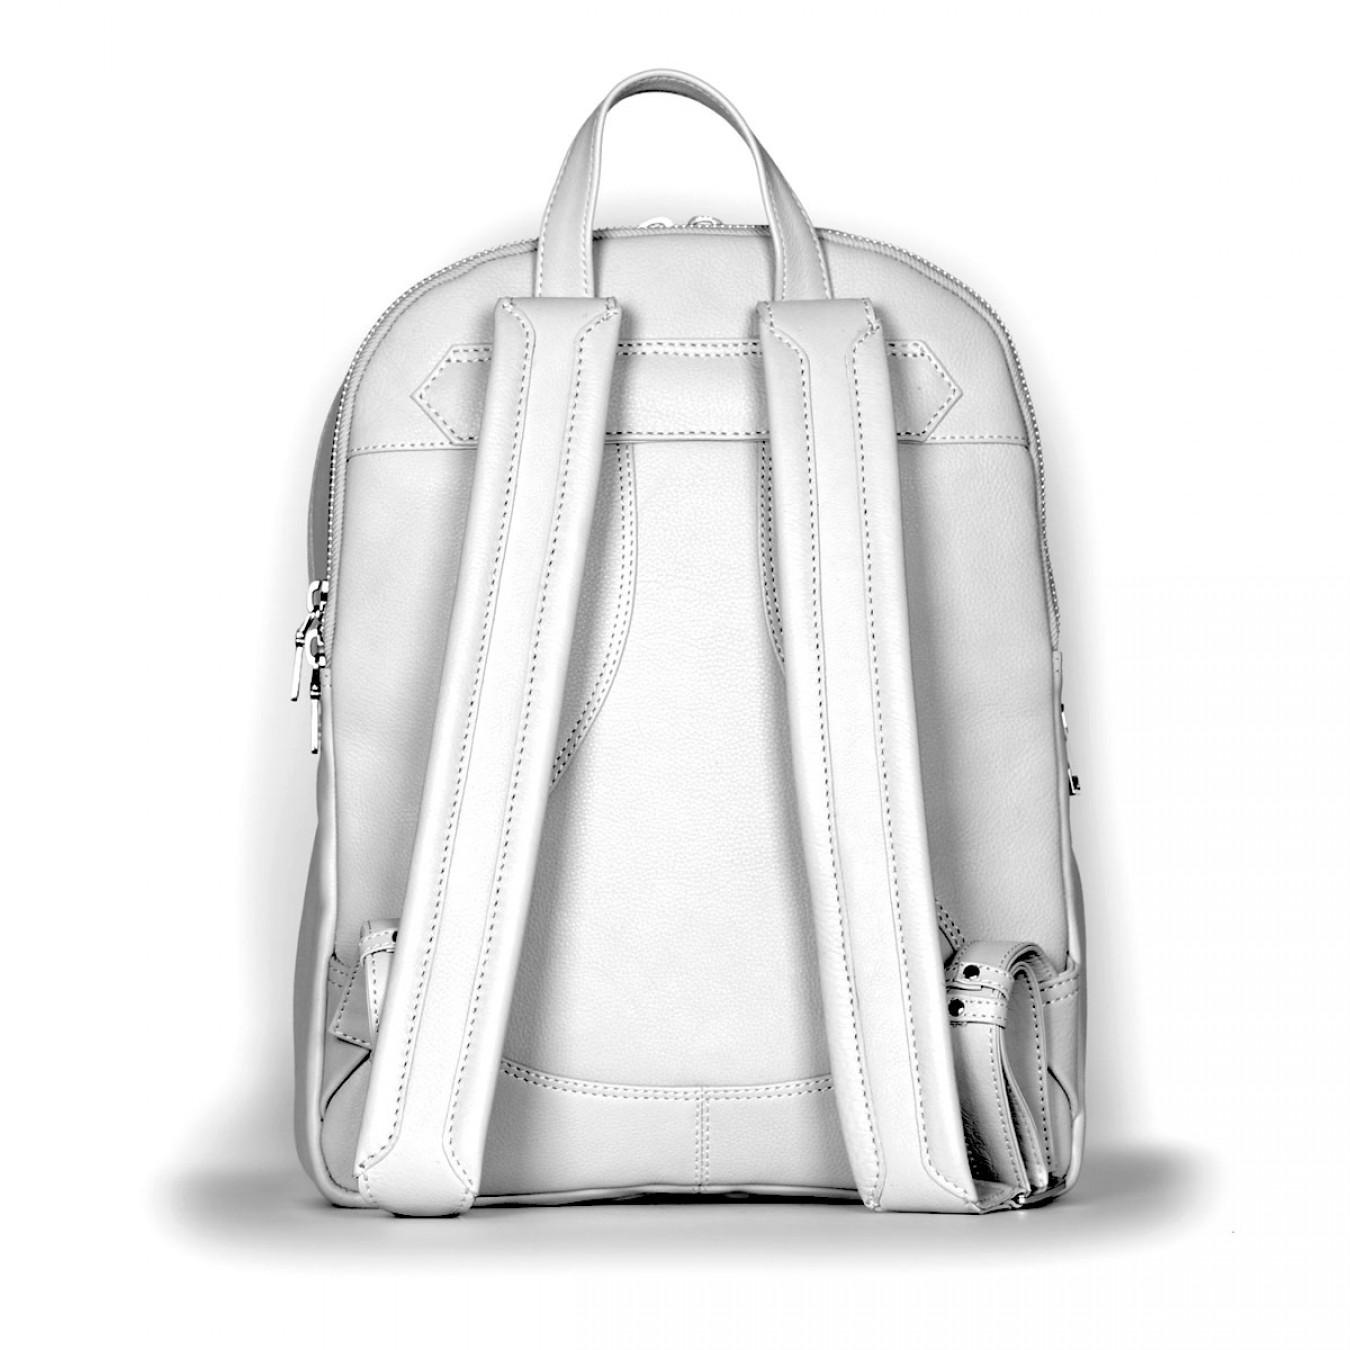 4340206f90 ... Vespa Σακίδιο Πλάτης Primavera 50TH Anniversary Backpack - Genuine Full  Grain Leather - Pearl Grey Τσάντες